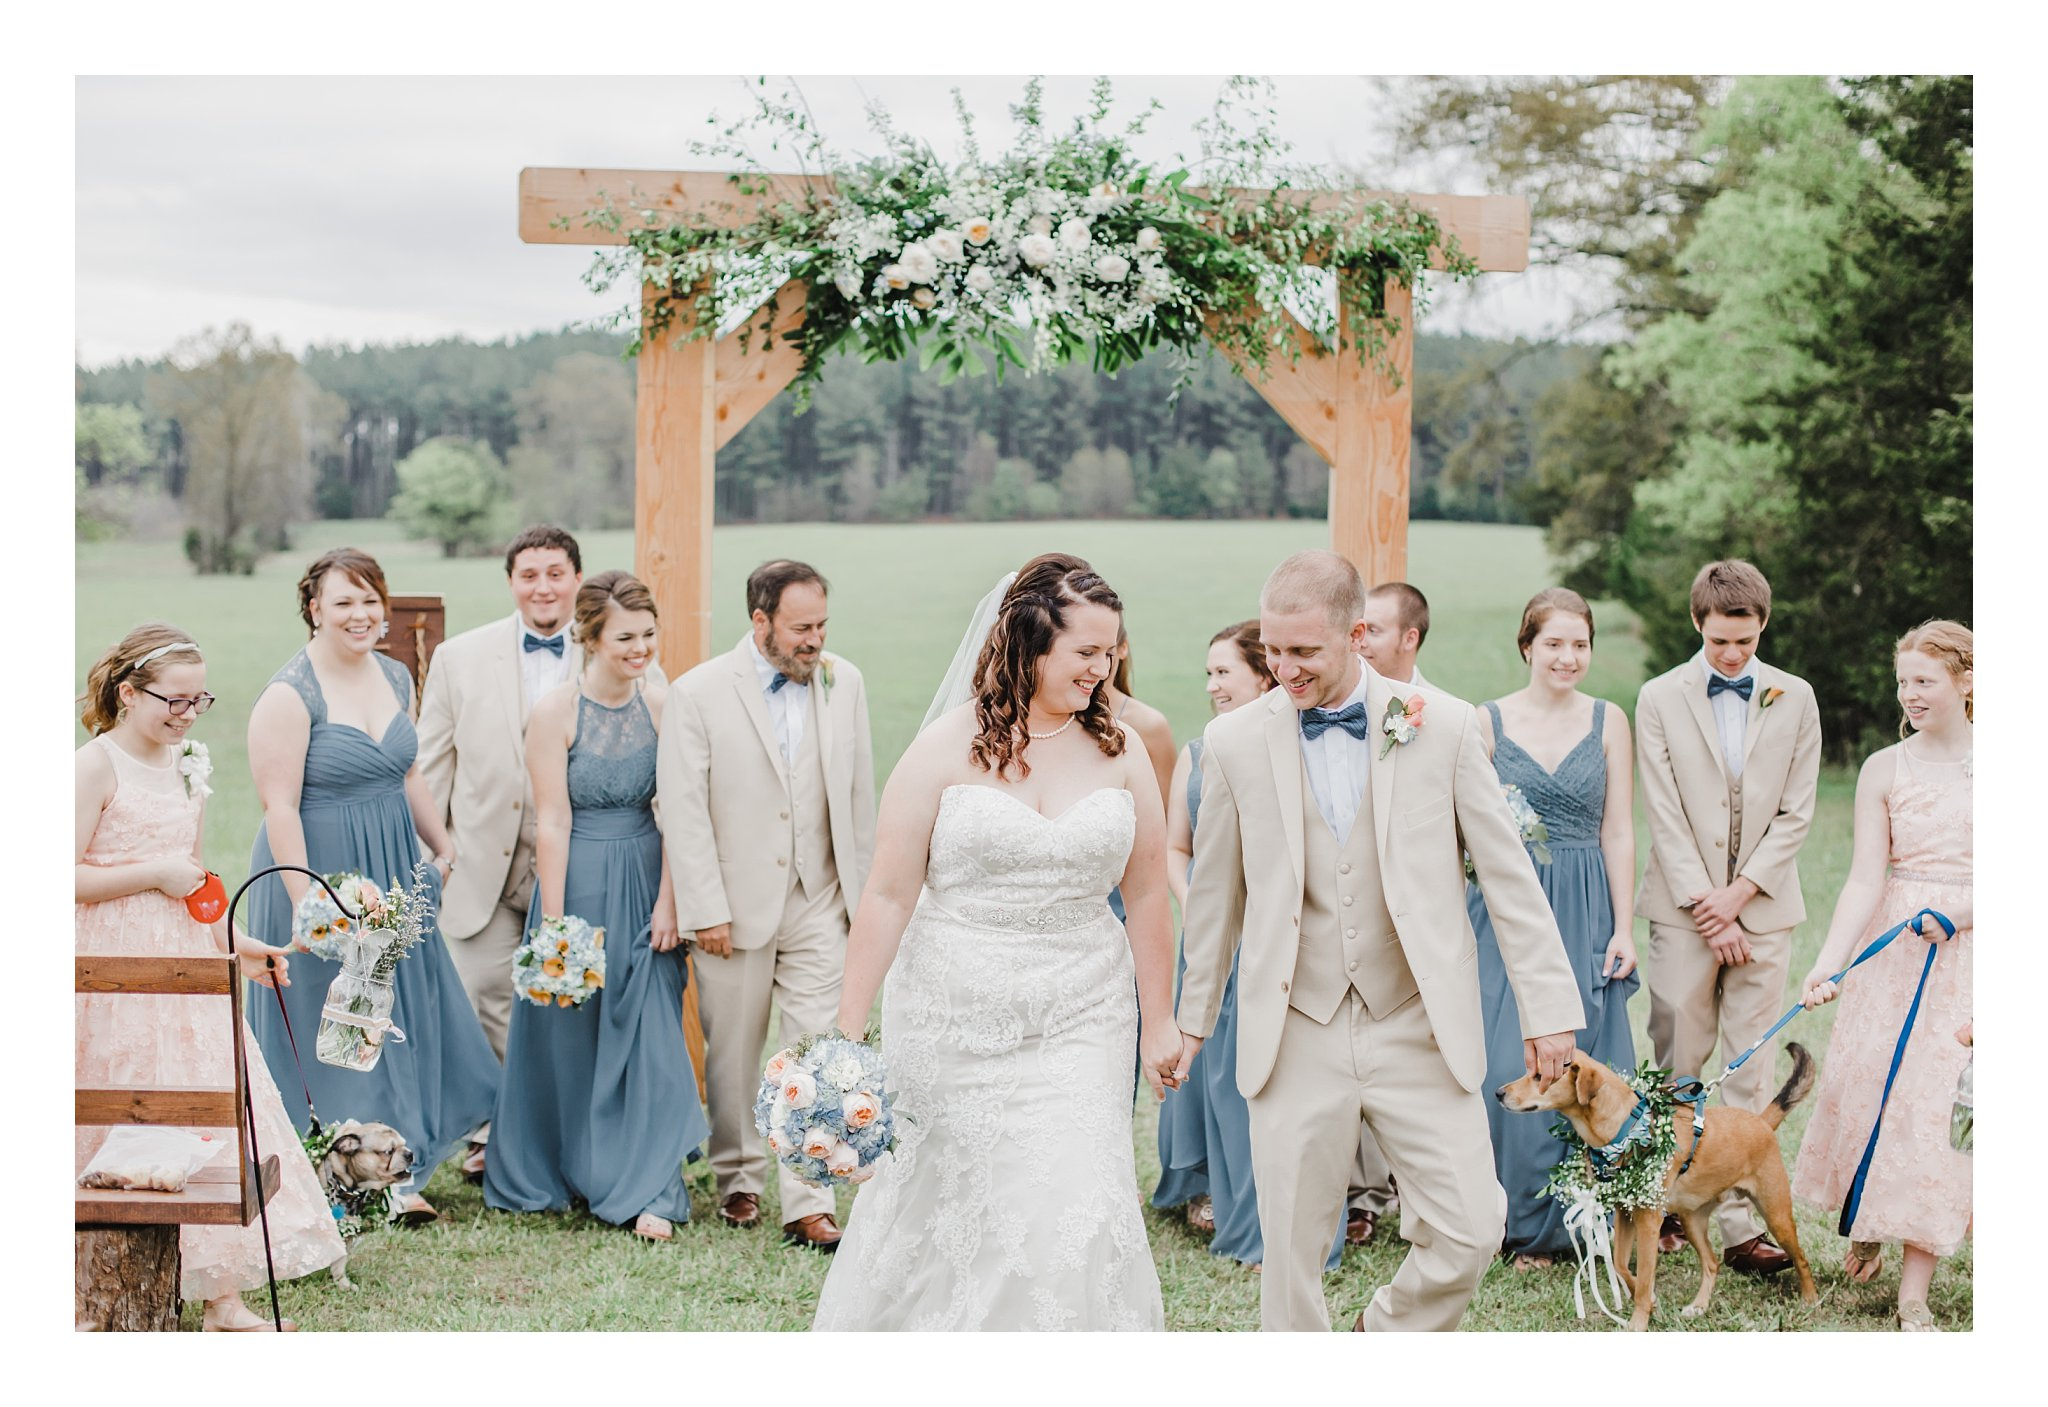 steel-blue-blush-spring-lace-gown-newberry-sc-wedding-photos-_0006.jpg